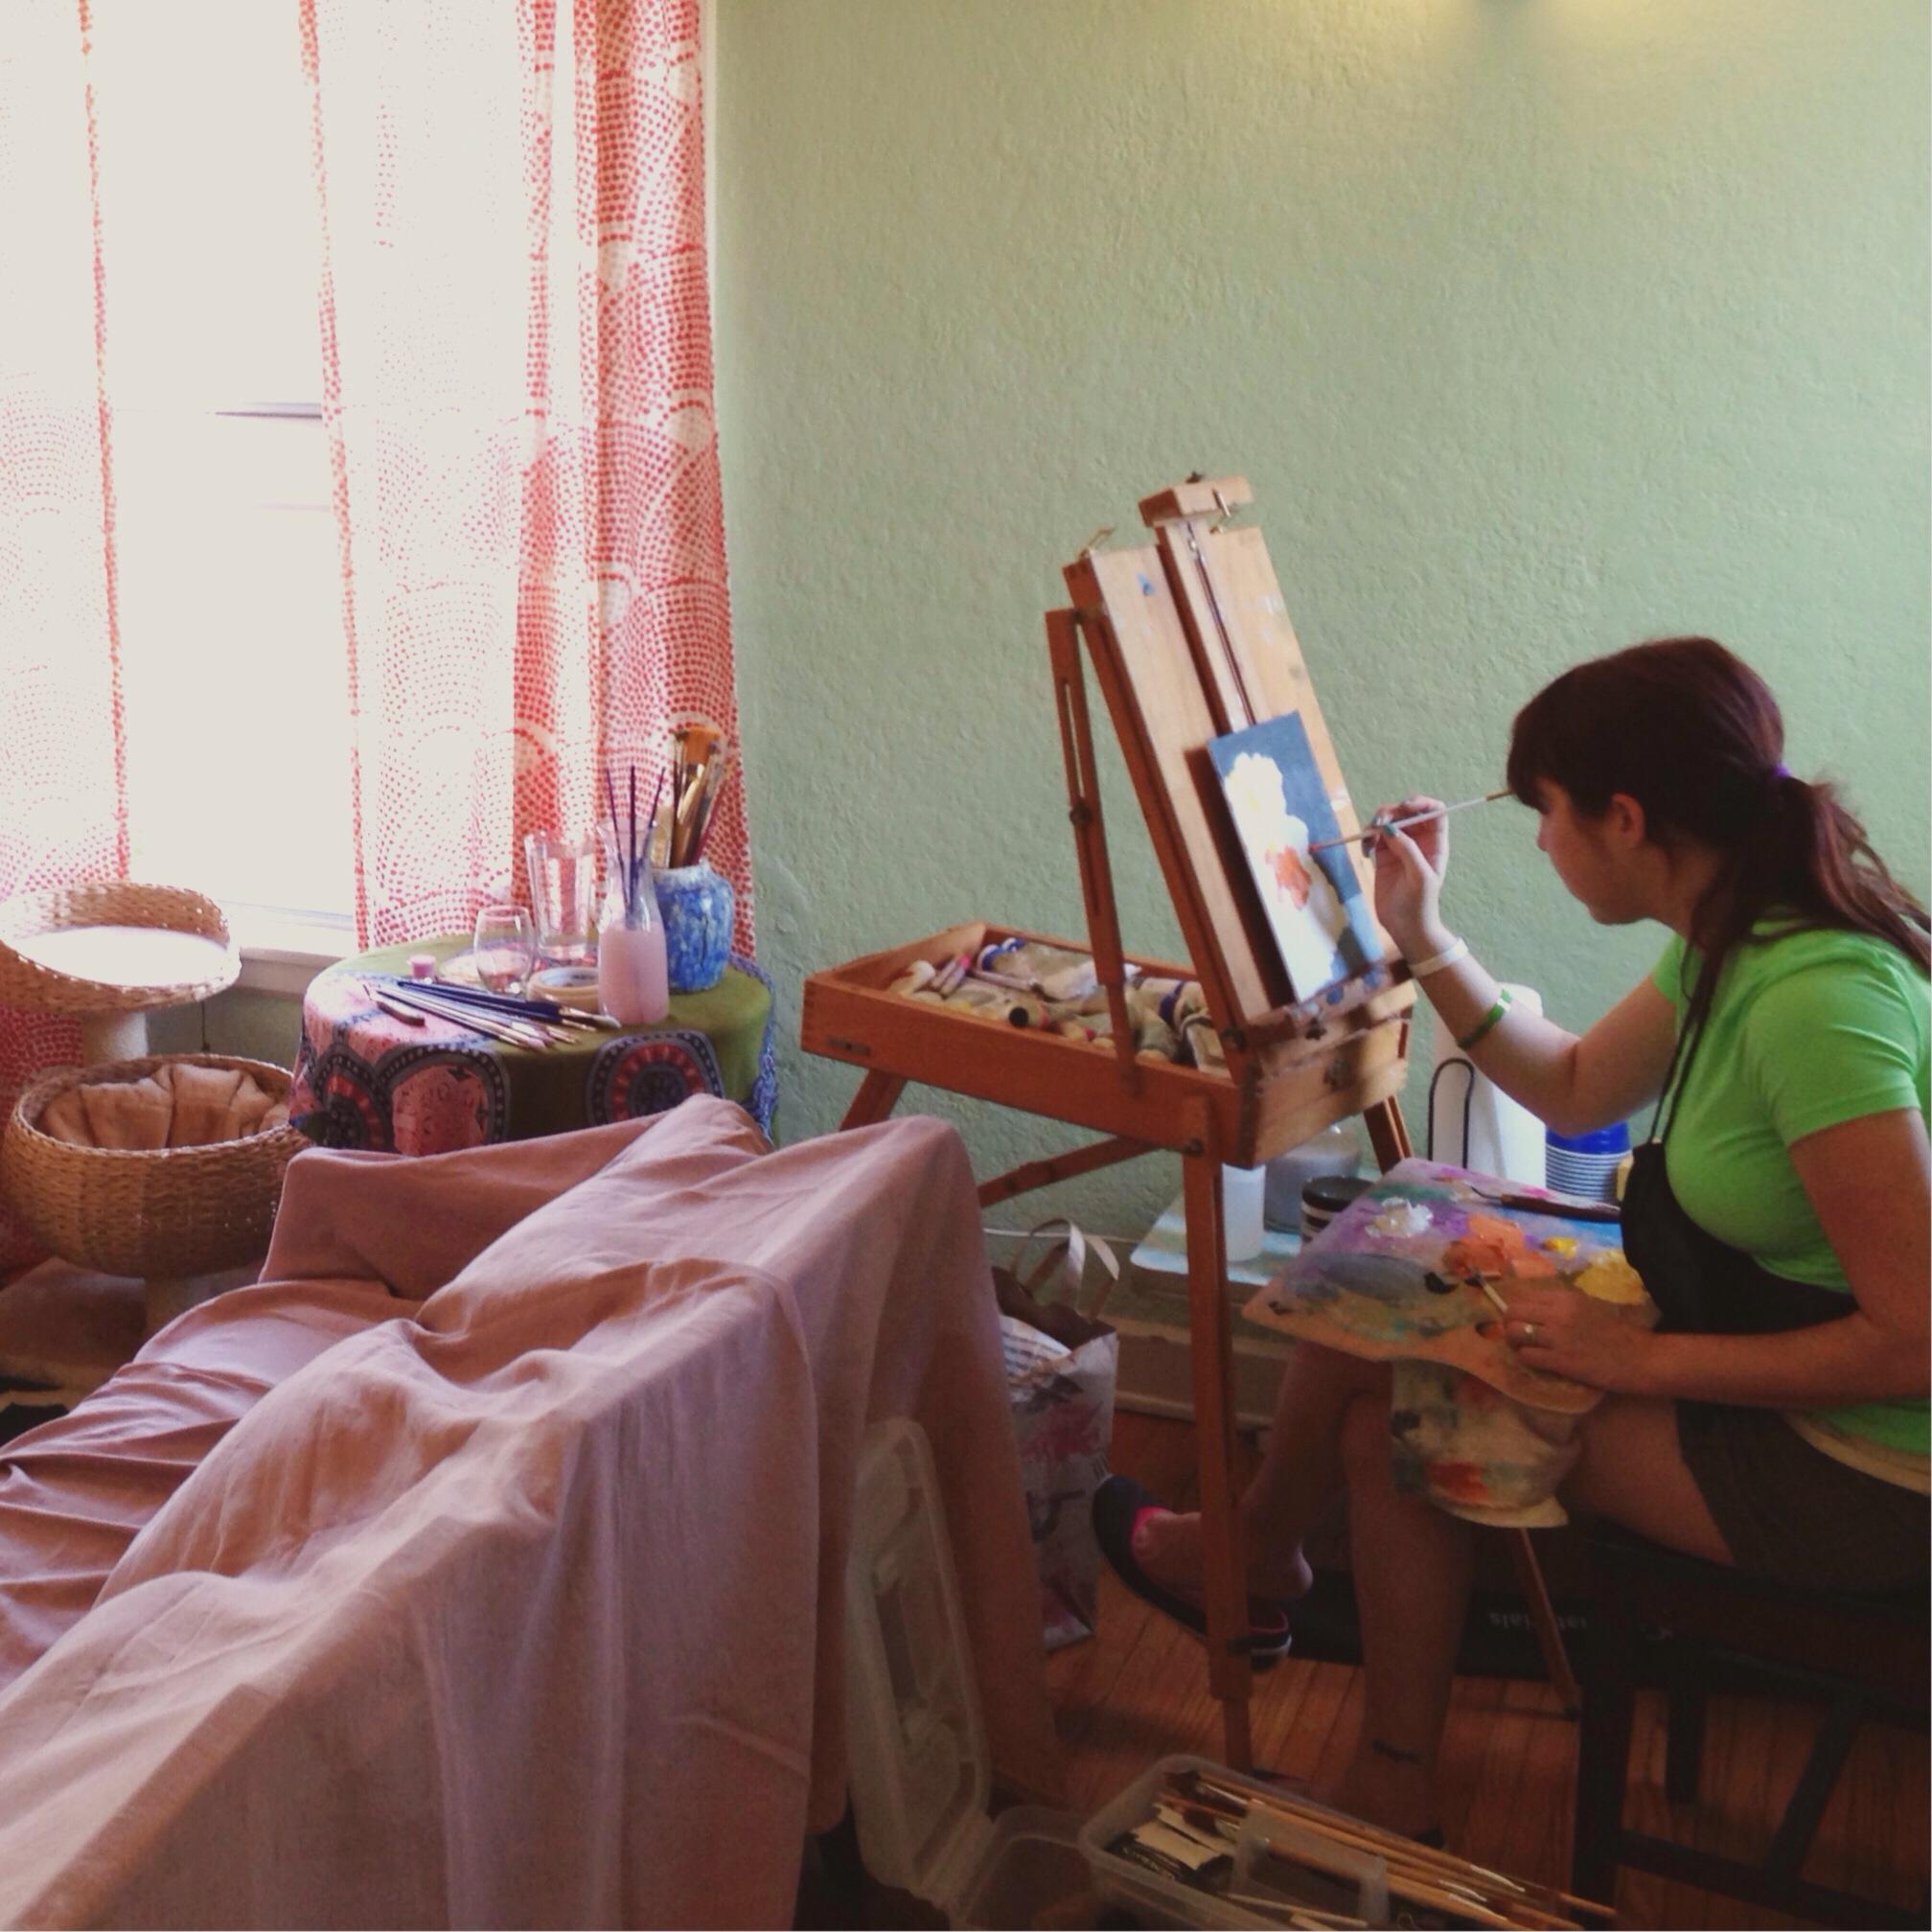 Heather painting, 2014.